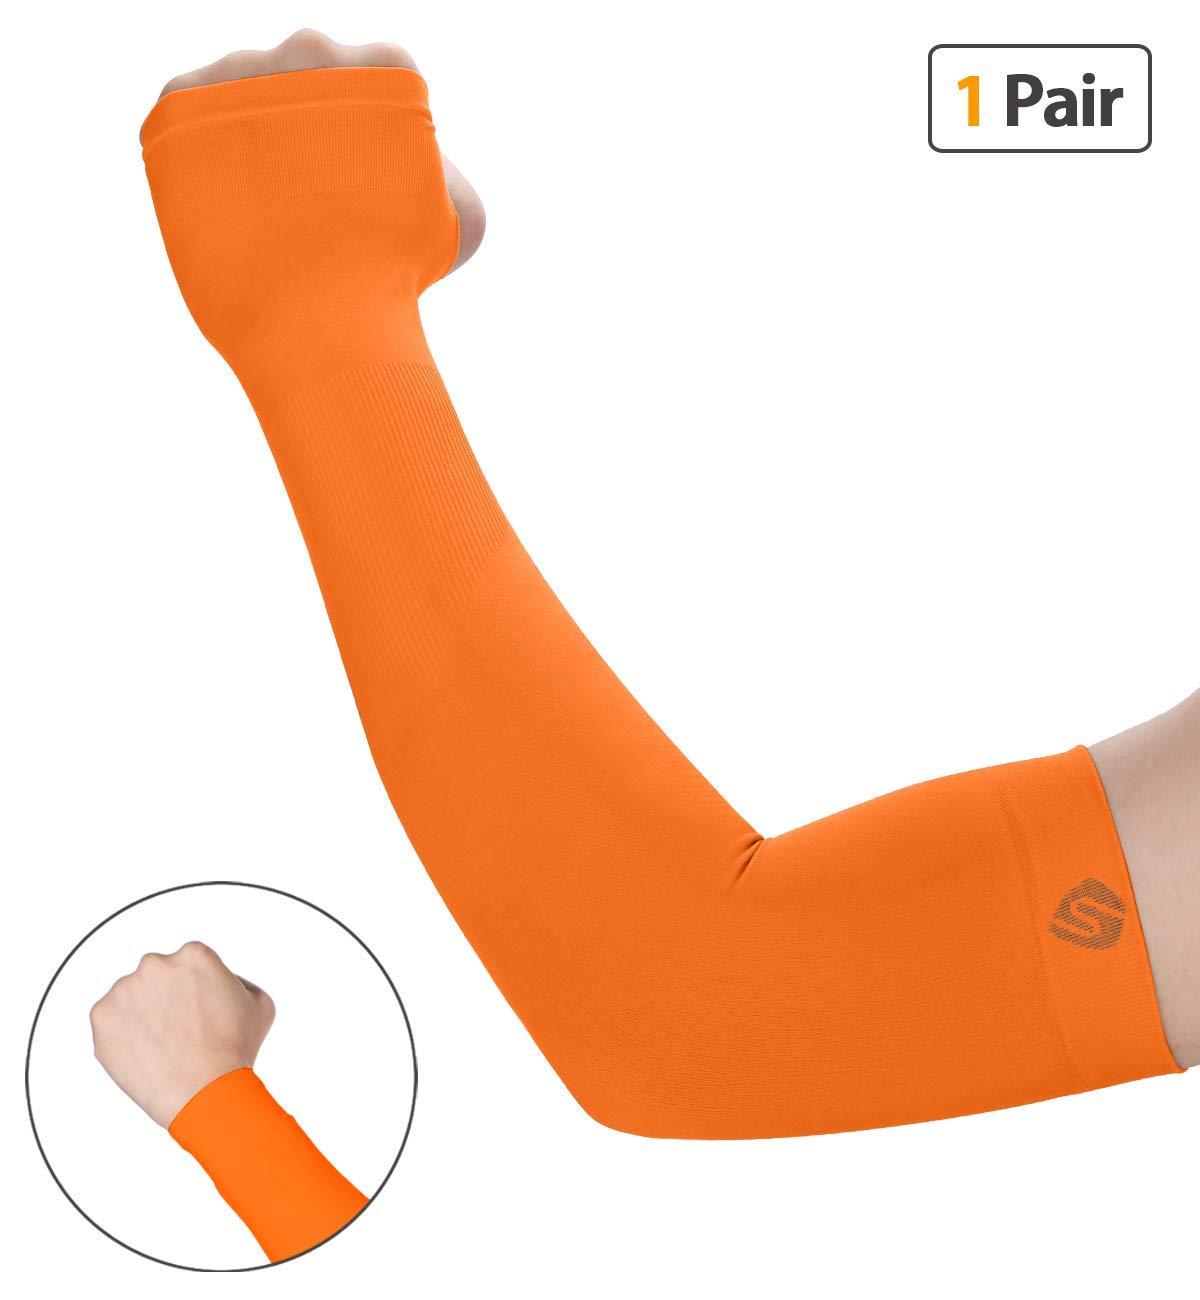 shinymod UV保護バスケットボールの冷却アームスリーブメンズレディースSunblockクーラー保護用スポーツ手袋ランニングゴルフサイクリング運転釣り1ペア/ 3ペアLong Tattooカバー袖 B0719Q56M2 1 Pair Orange  1 Pair Orange